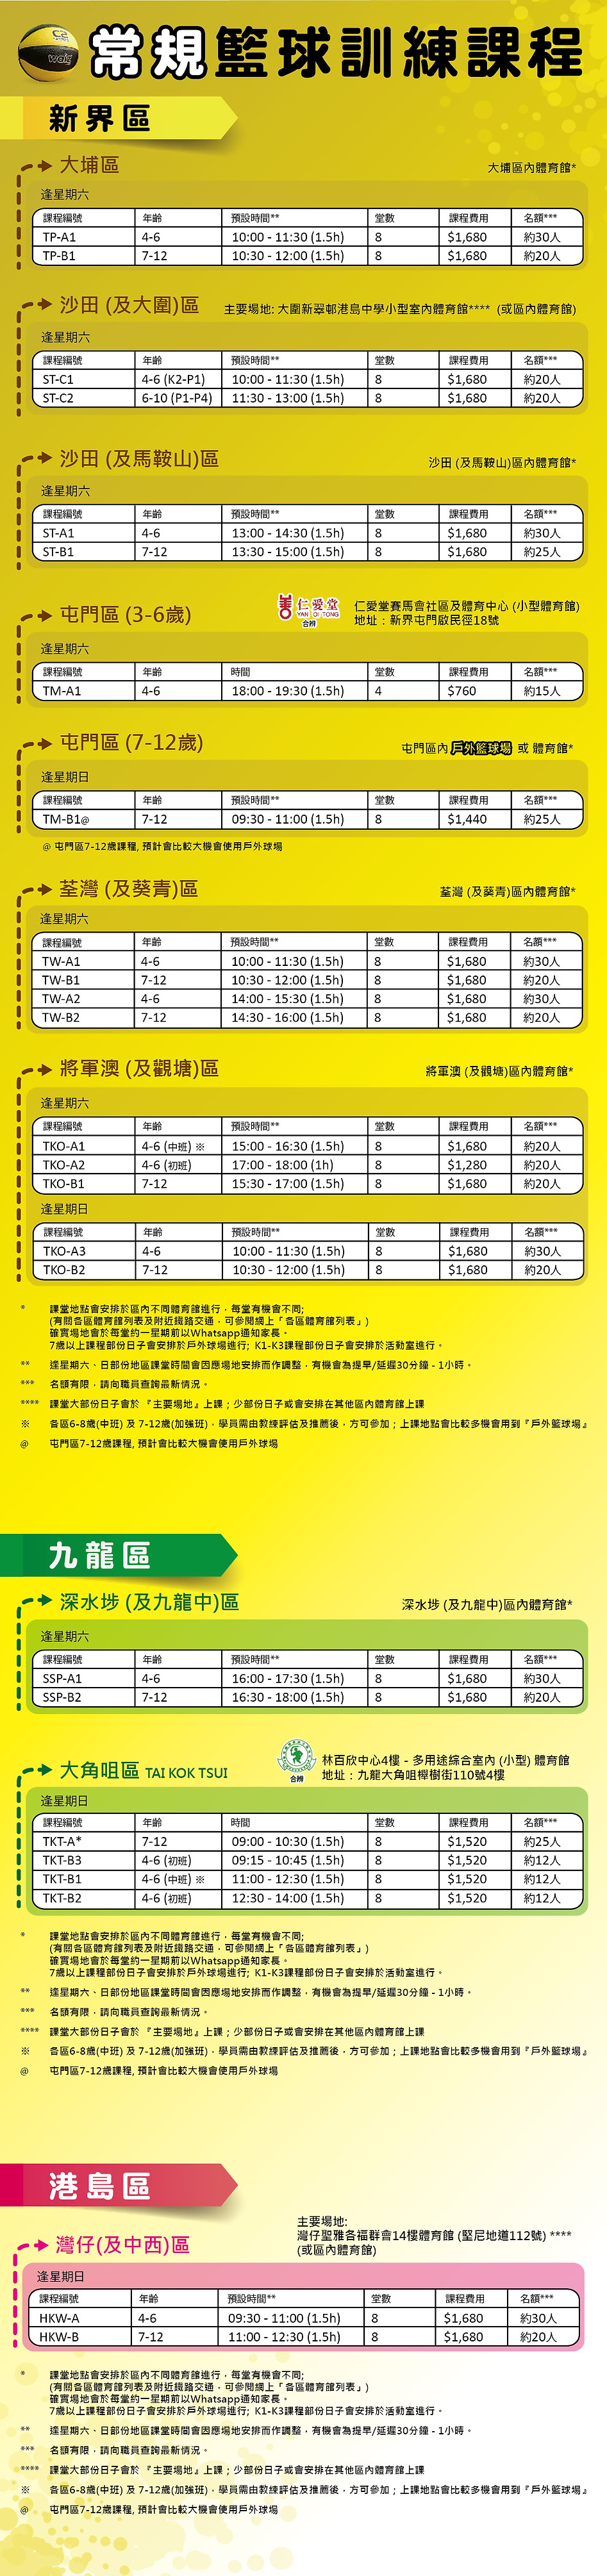 C2 Sports Free Class Leaflet ref0033-202